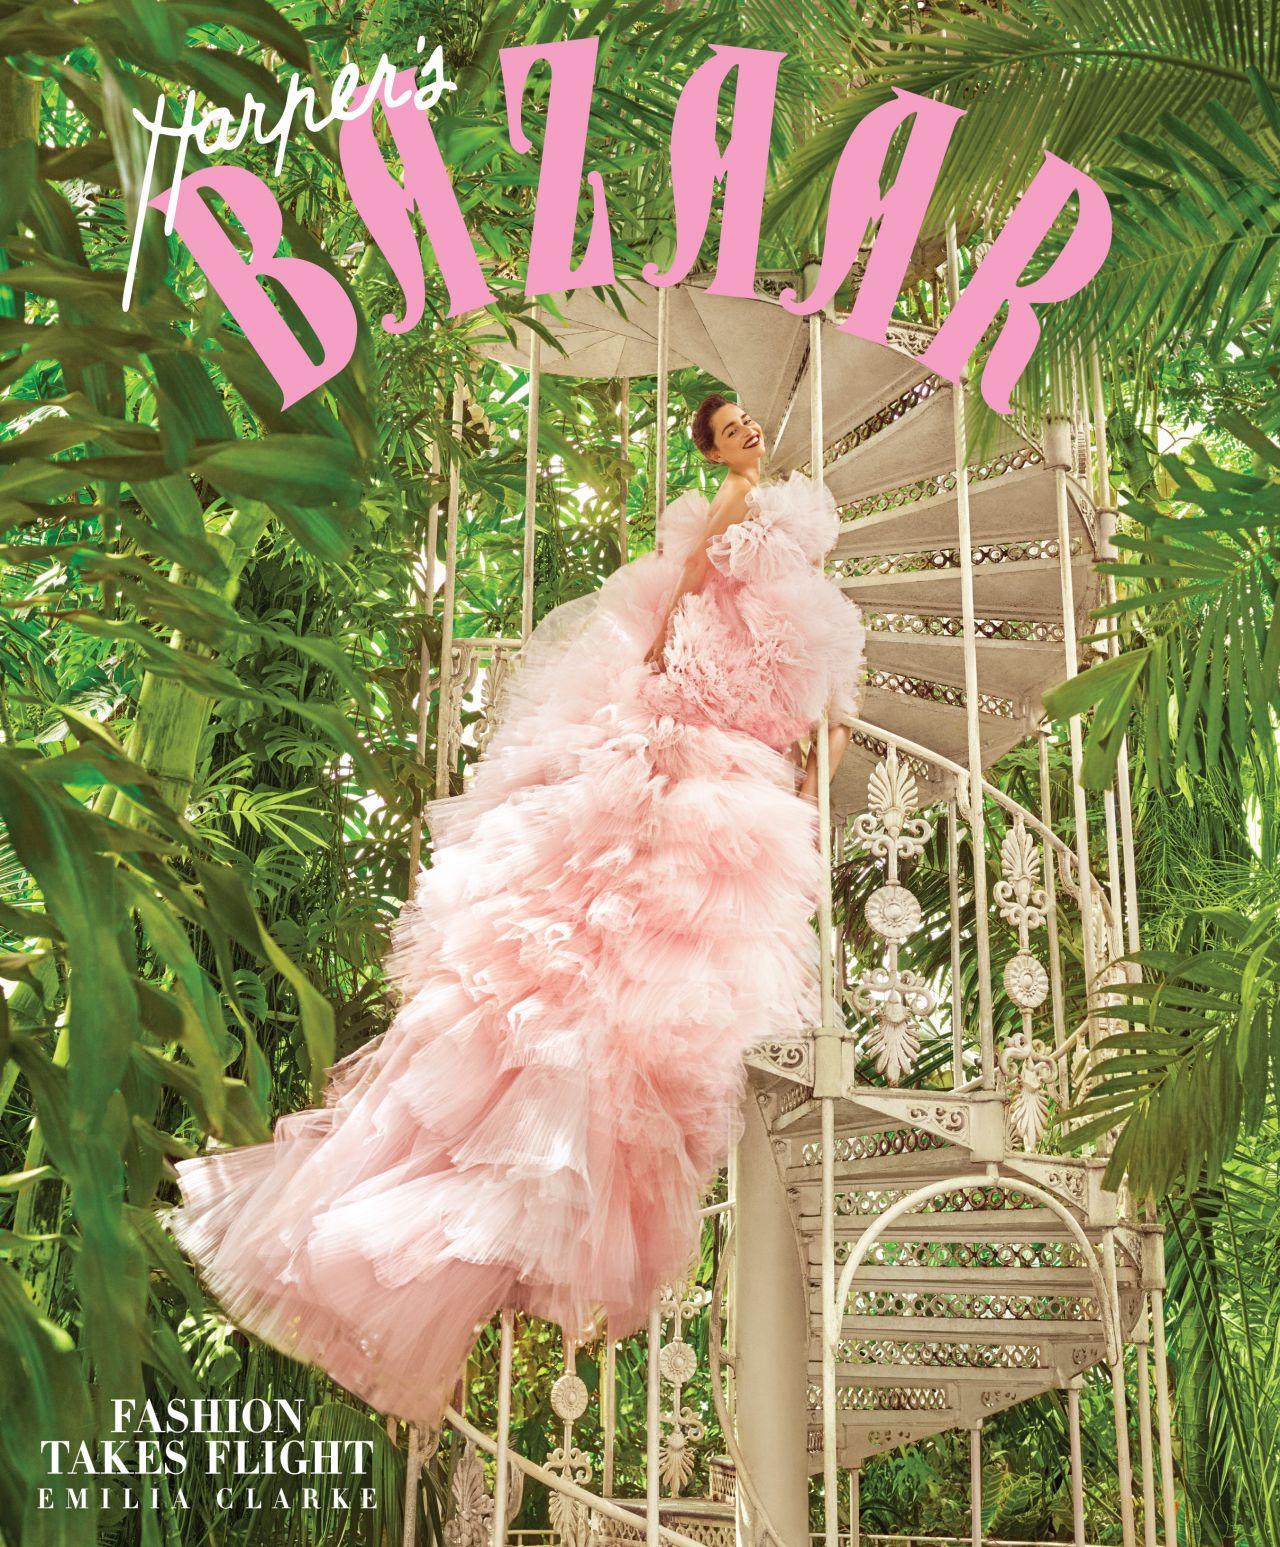 http://celebmafia.com/wp-content/uploads/2017/11/emilia-clarke-harper-s-bazaar-magazine-us-december-2017-january-2018-0.jpg